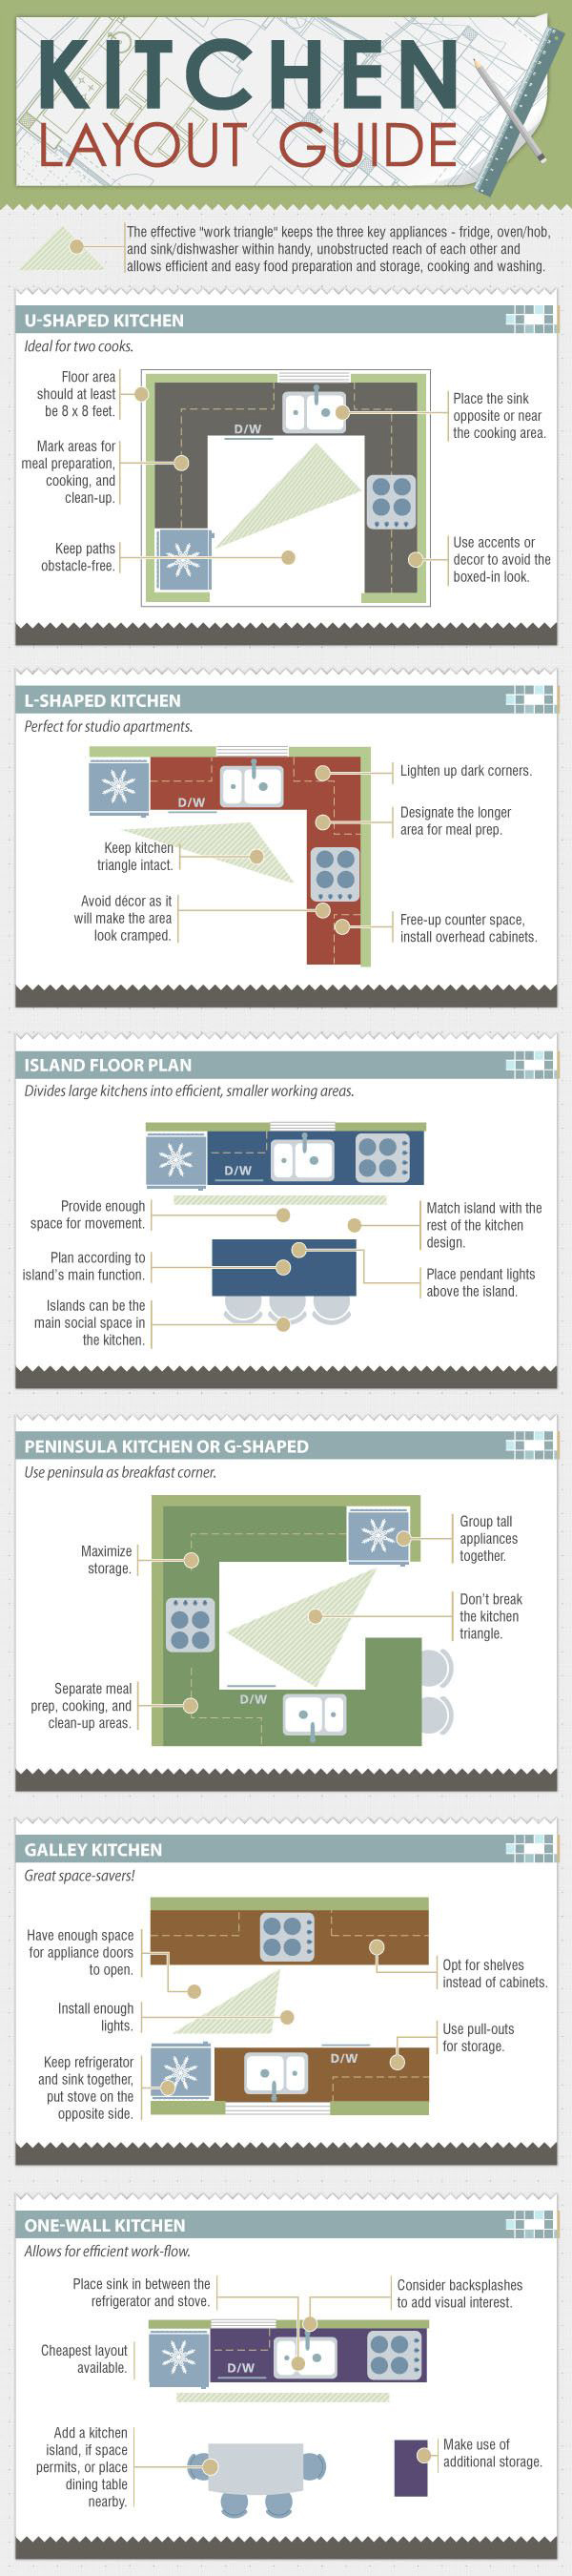 Kitchen layout guide kitchen pinterest layouts kitchens and